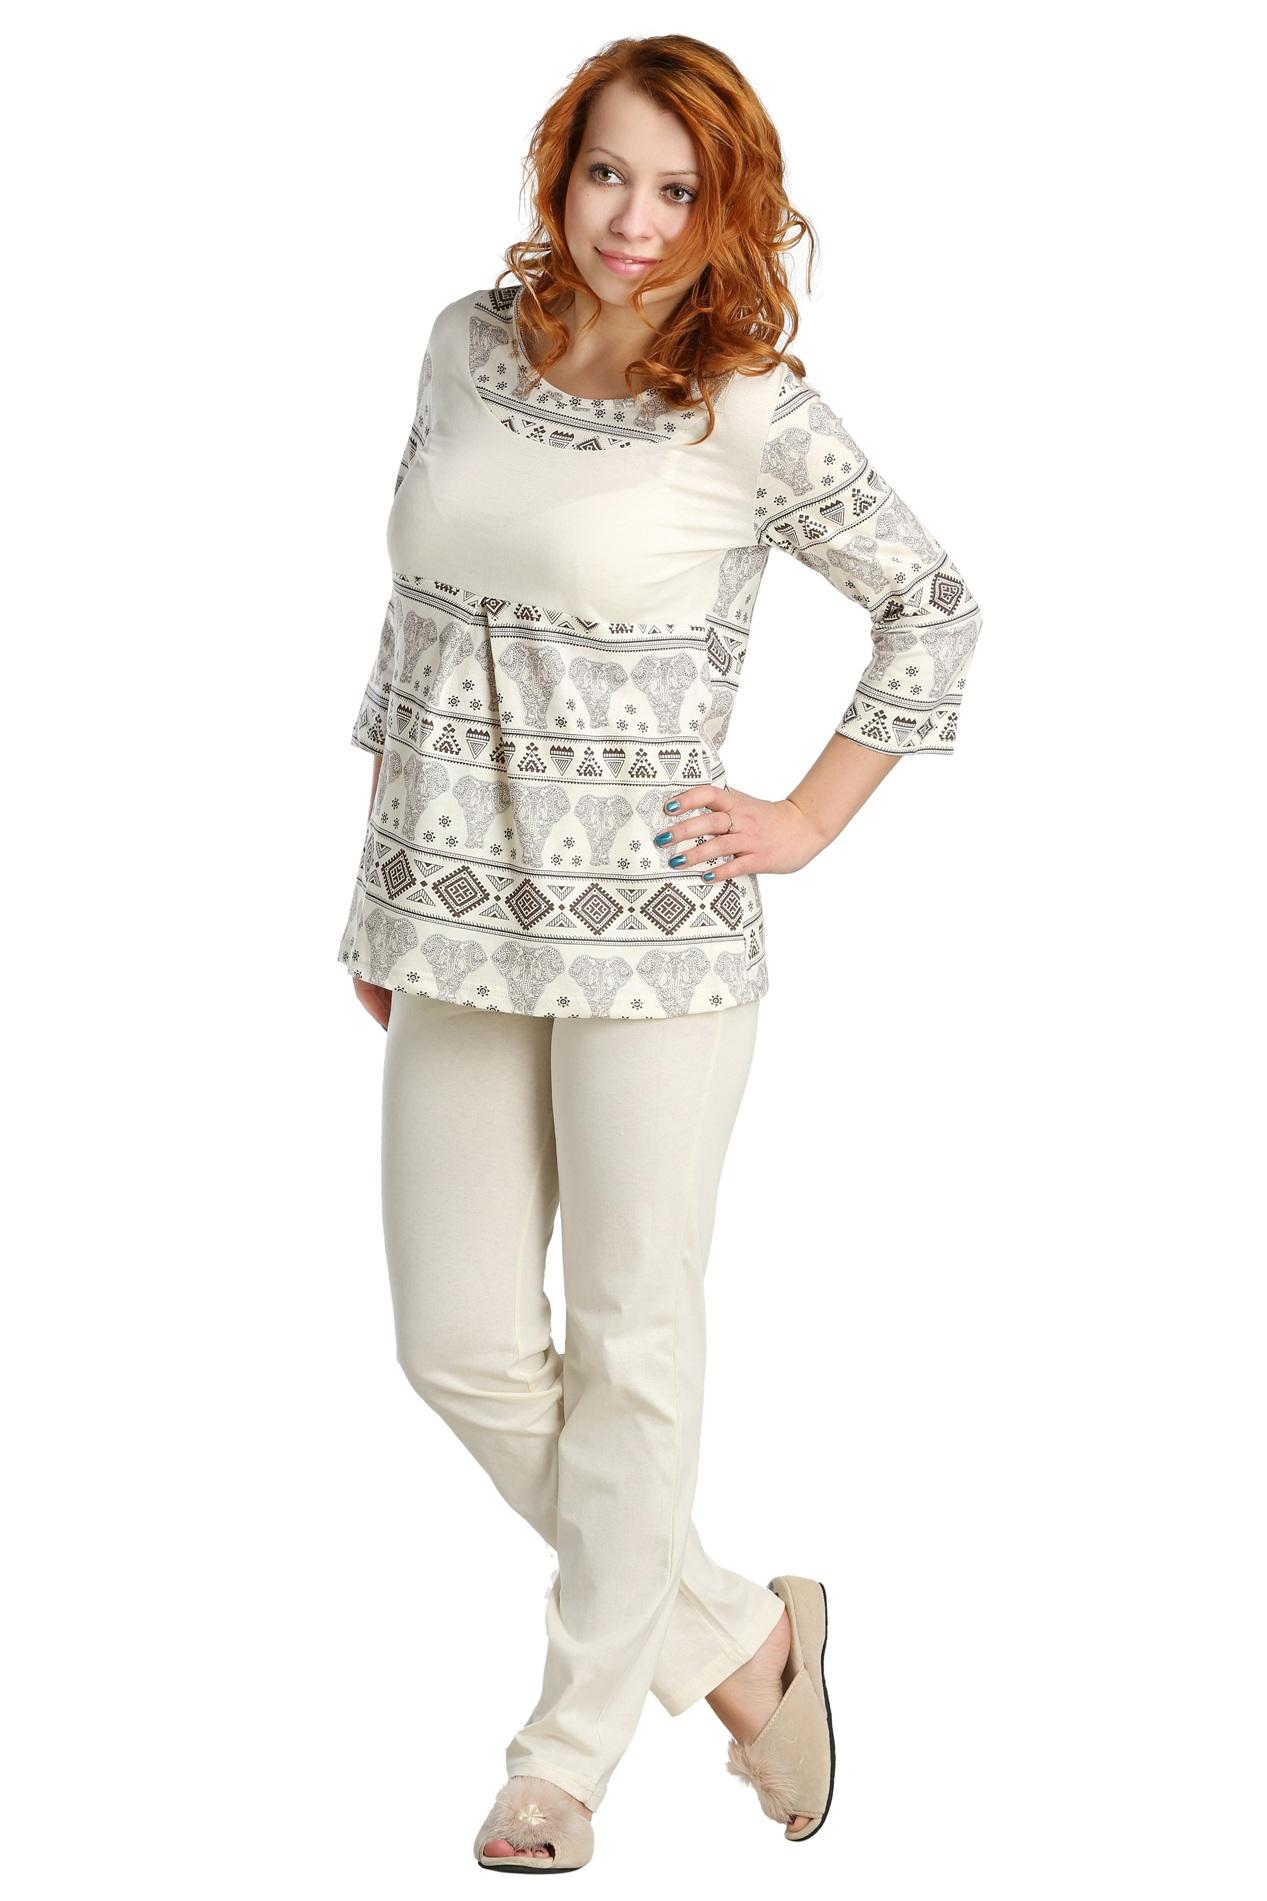 Жен. пижама арт. 16-0087 Молочный р. 52 - Женская одежда артикул: 21995